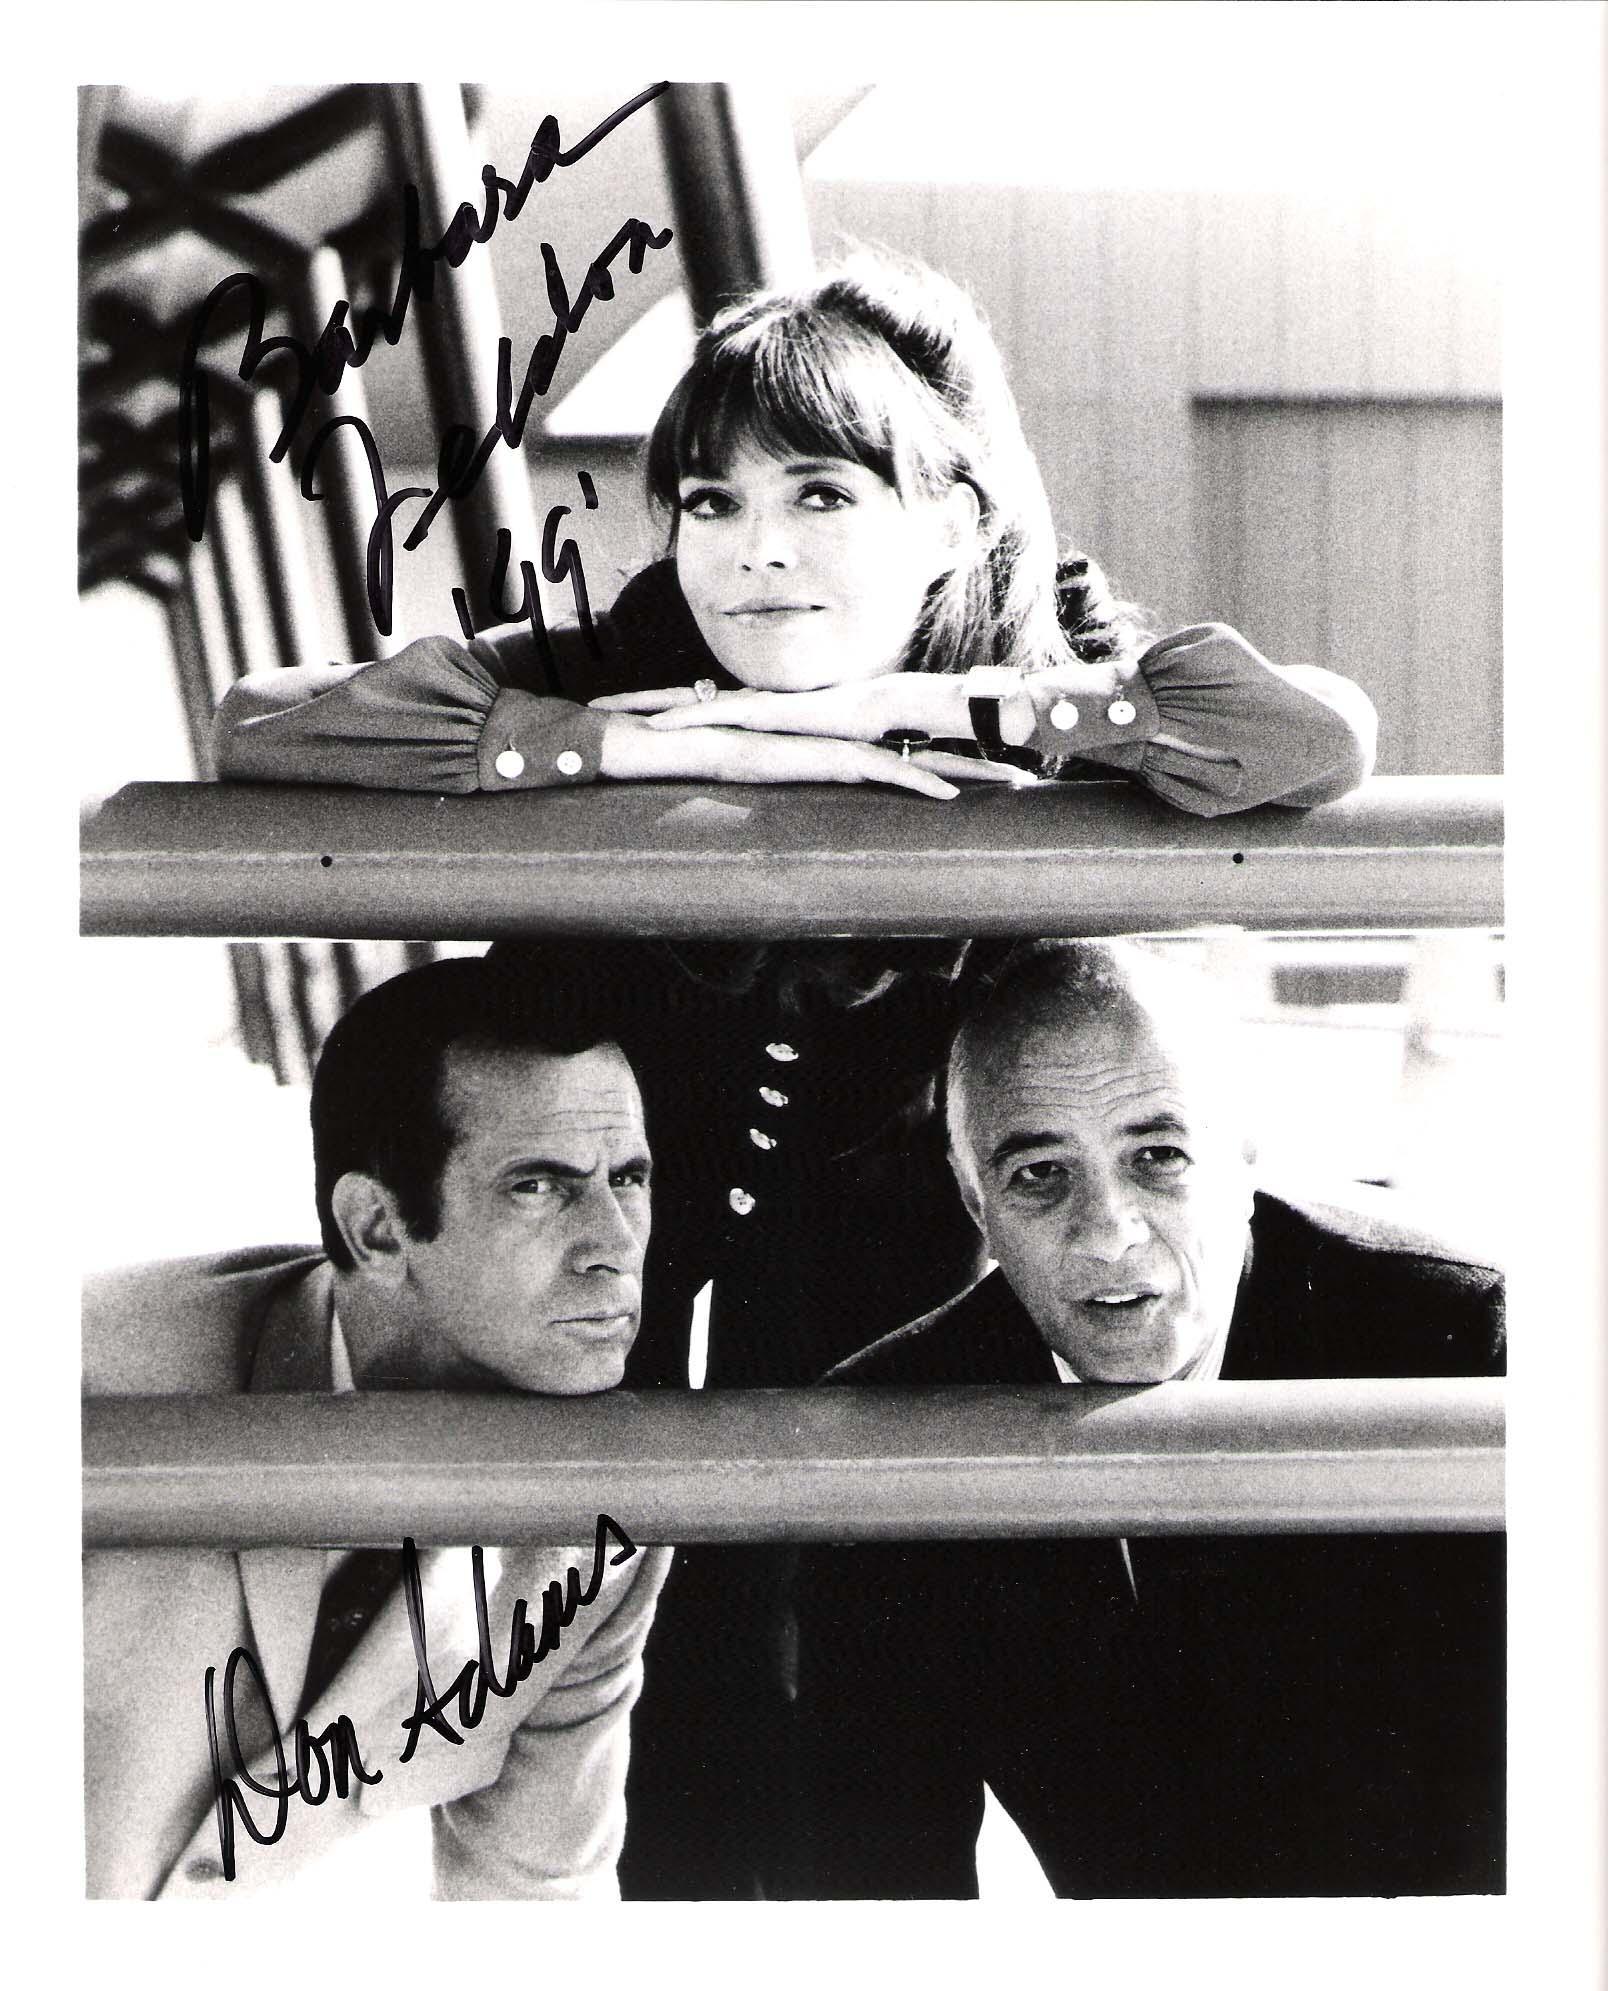 Autographed Don Adams Photograph - MAXWELL SMART) & BARBARA FELDON AGENT 99 Both 8x10 B W